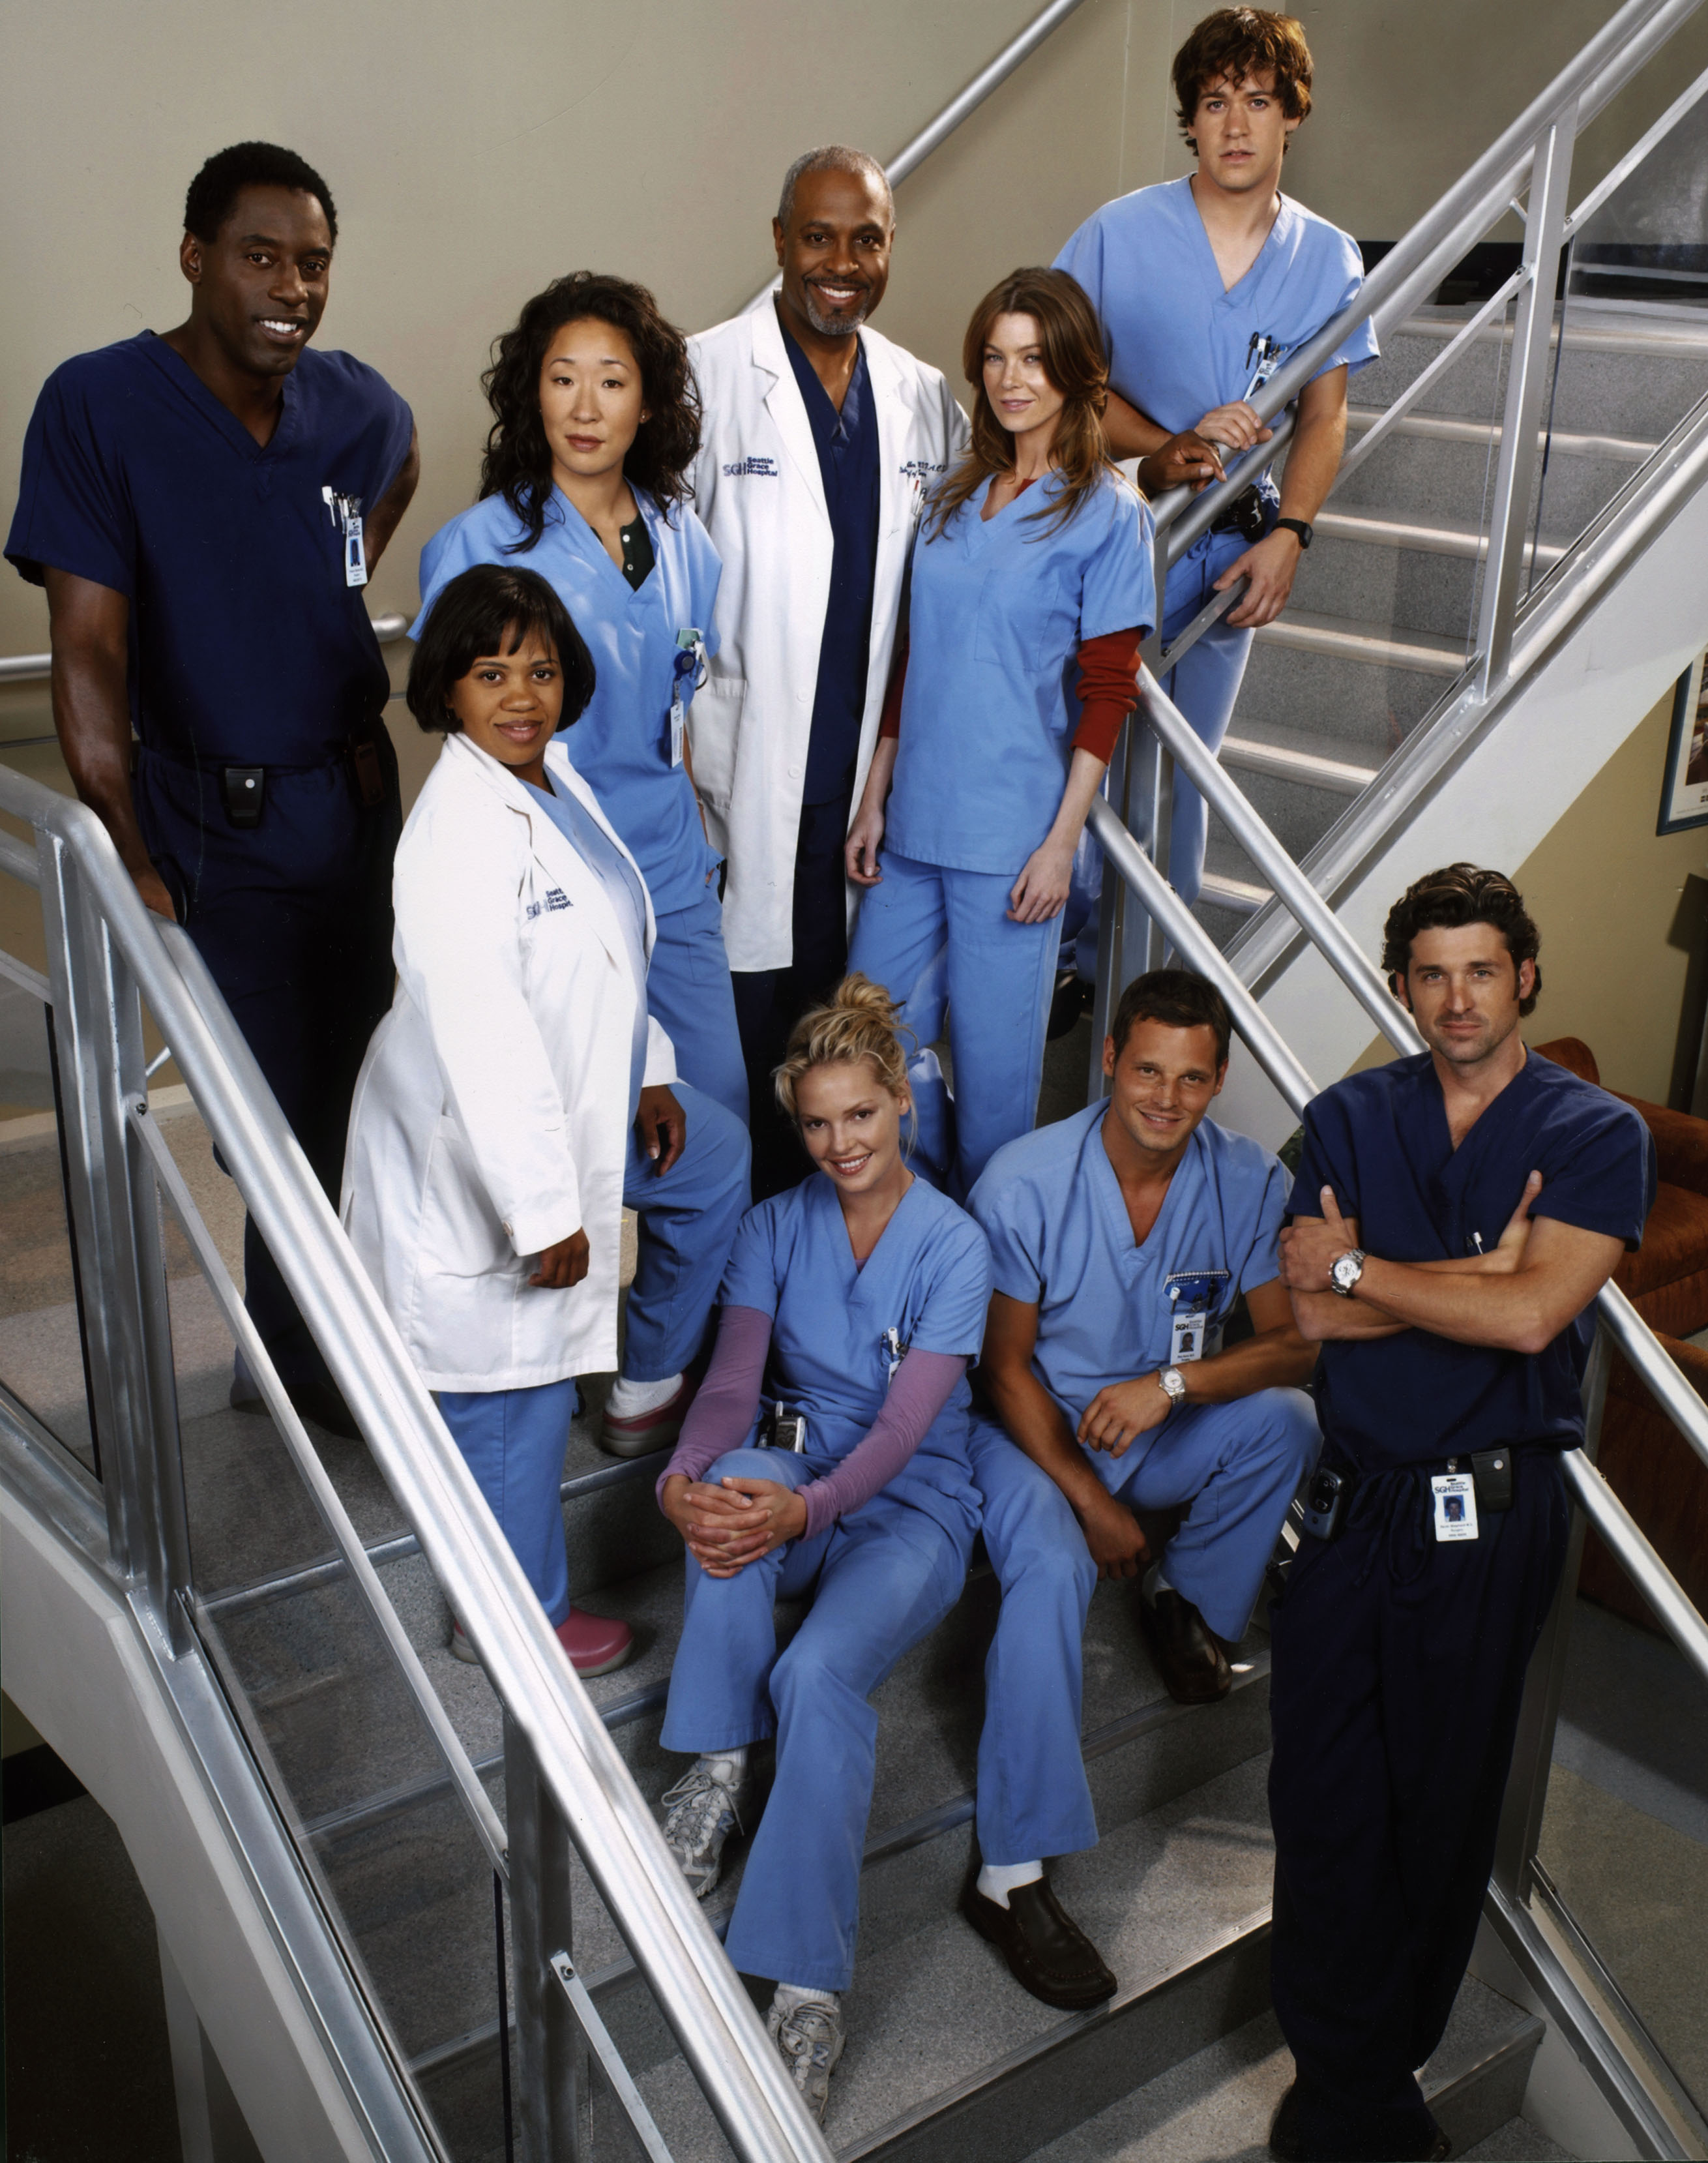 Grey S Anatomy Stars Kids Ellen Pompeo Justin Chambers And More